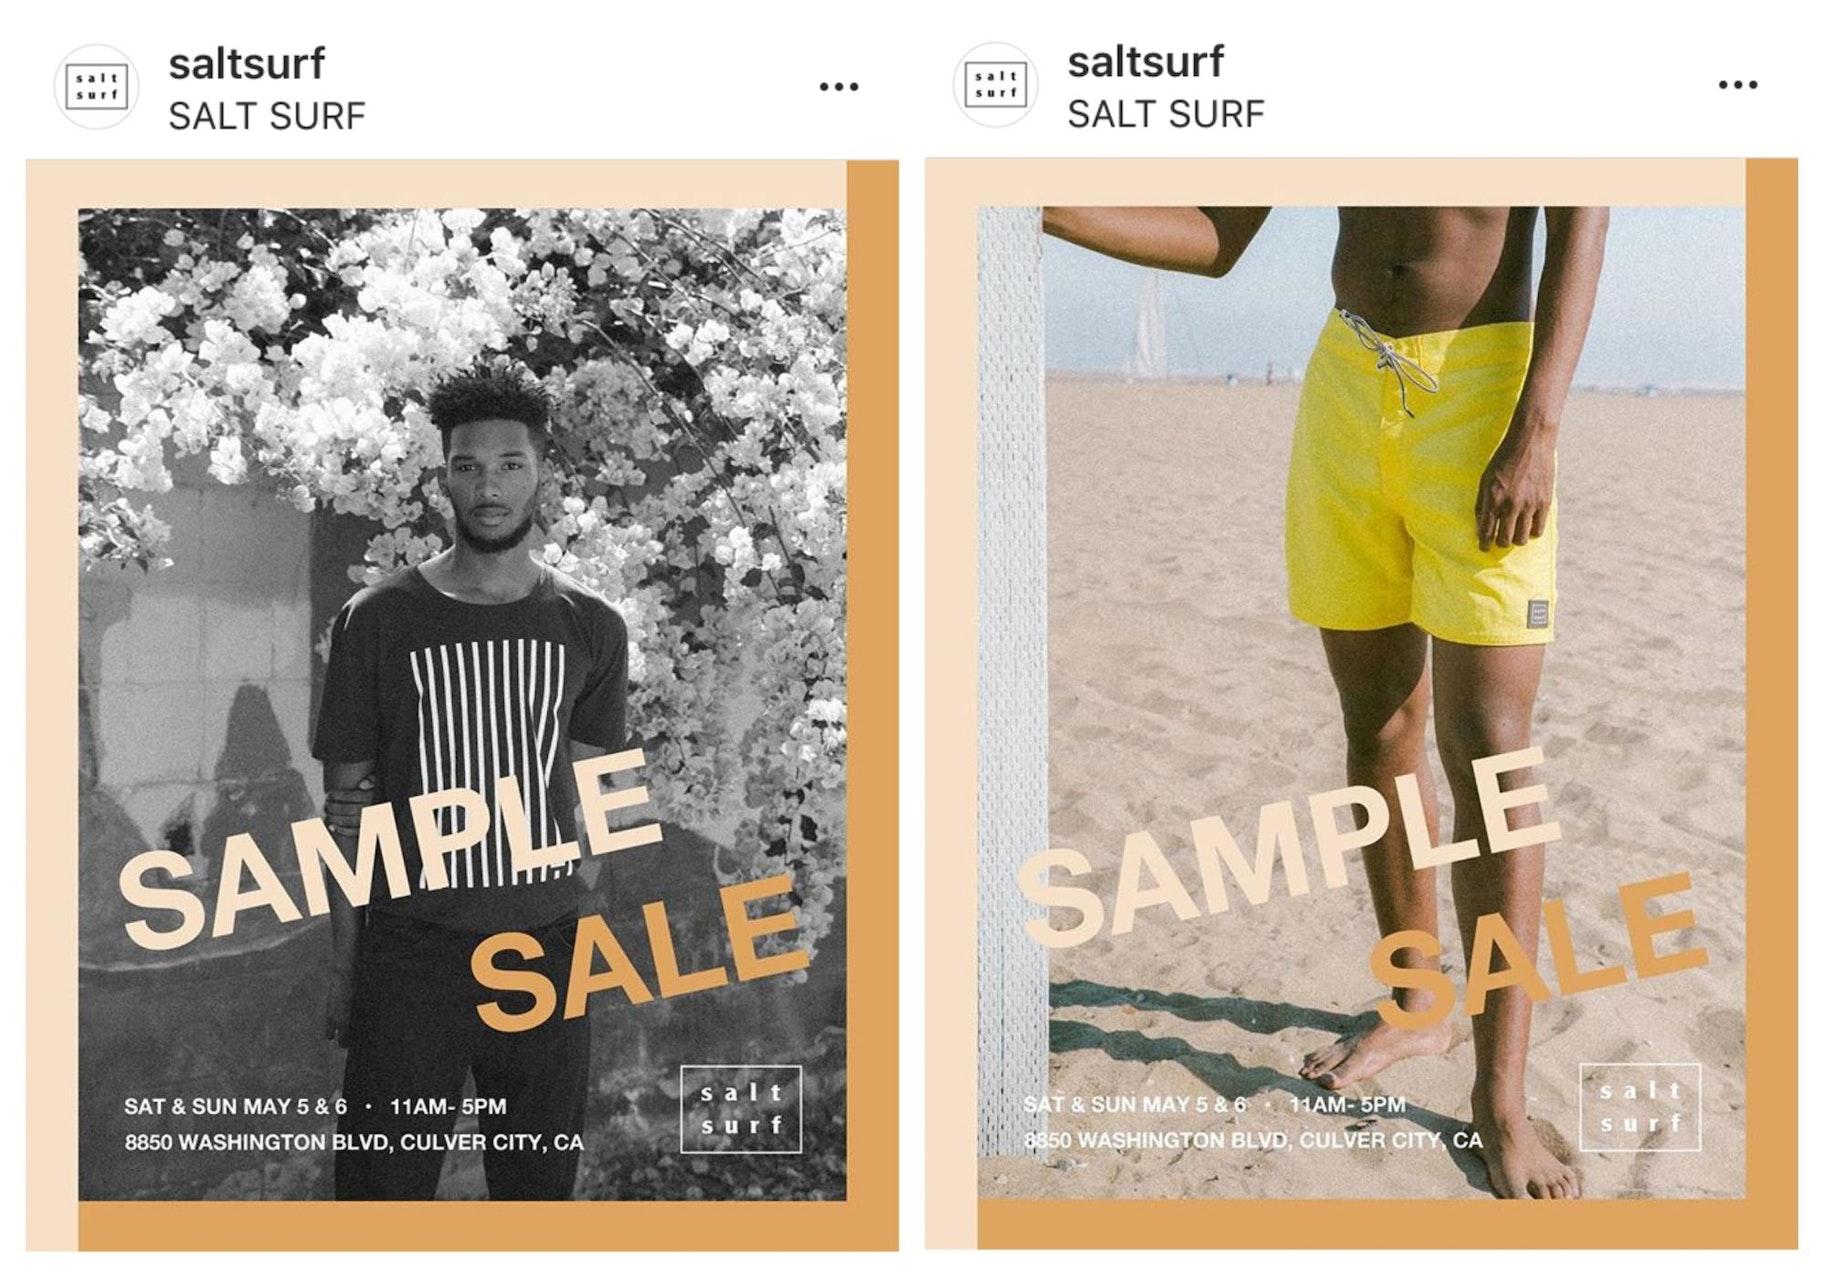 Salt Suf Instagram Templates